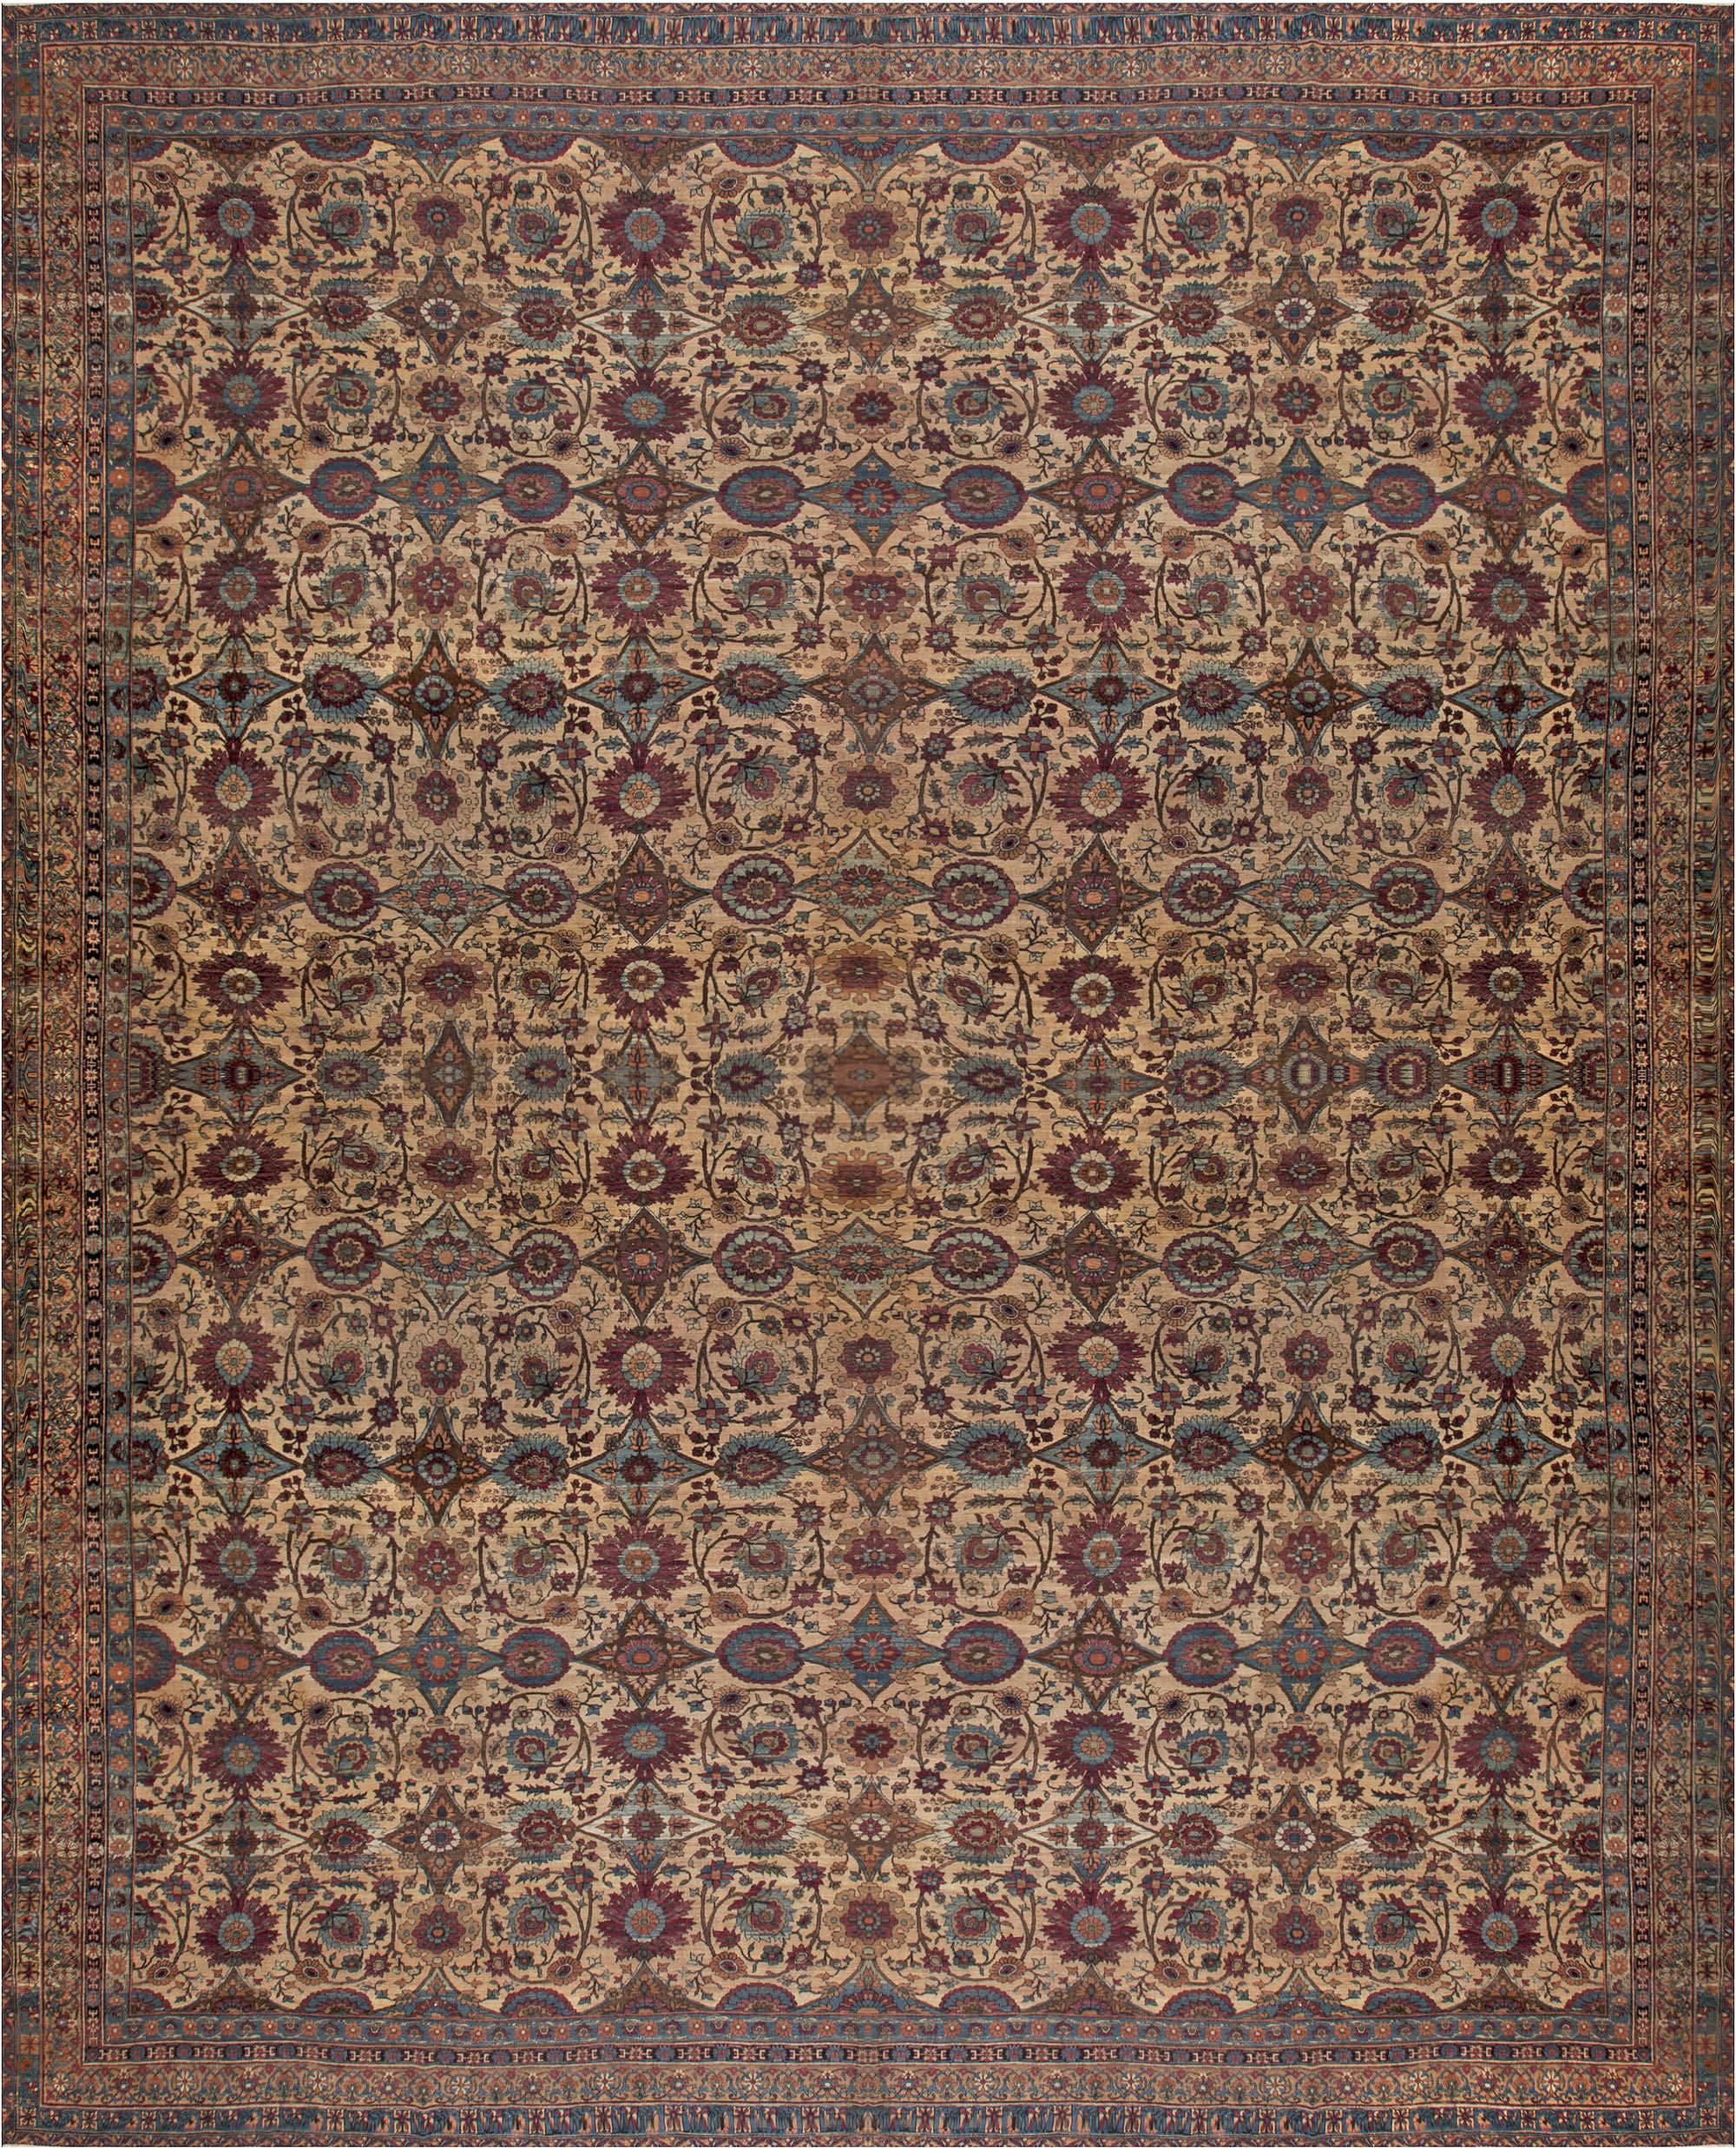 Extra Large Persian Kirman Antique Rug BB6832